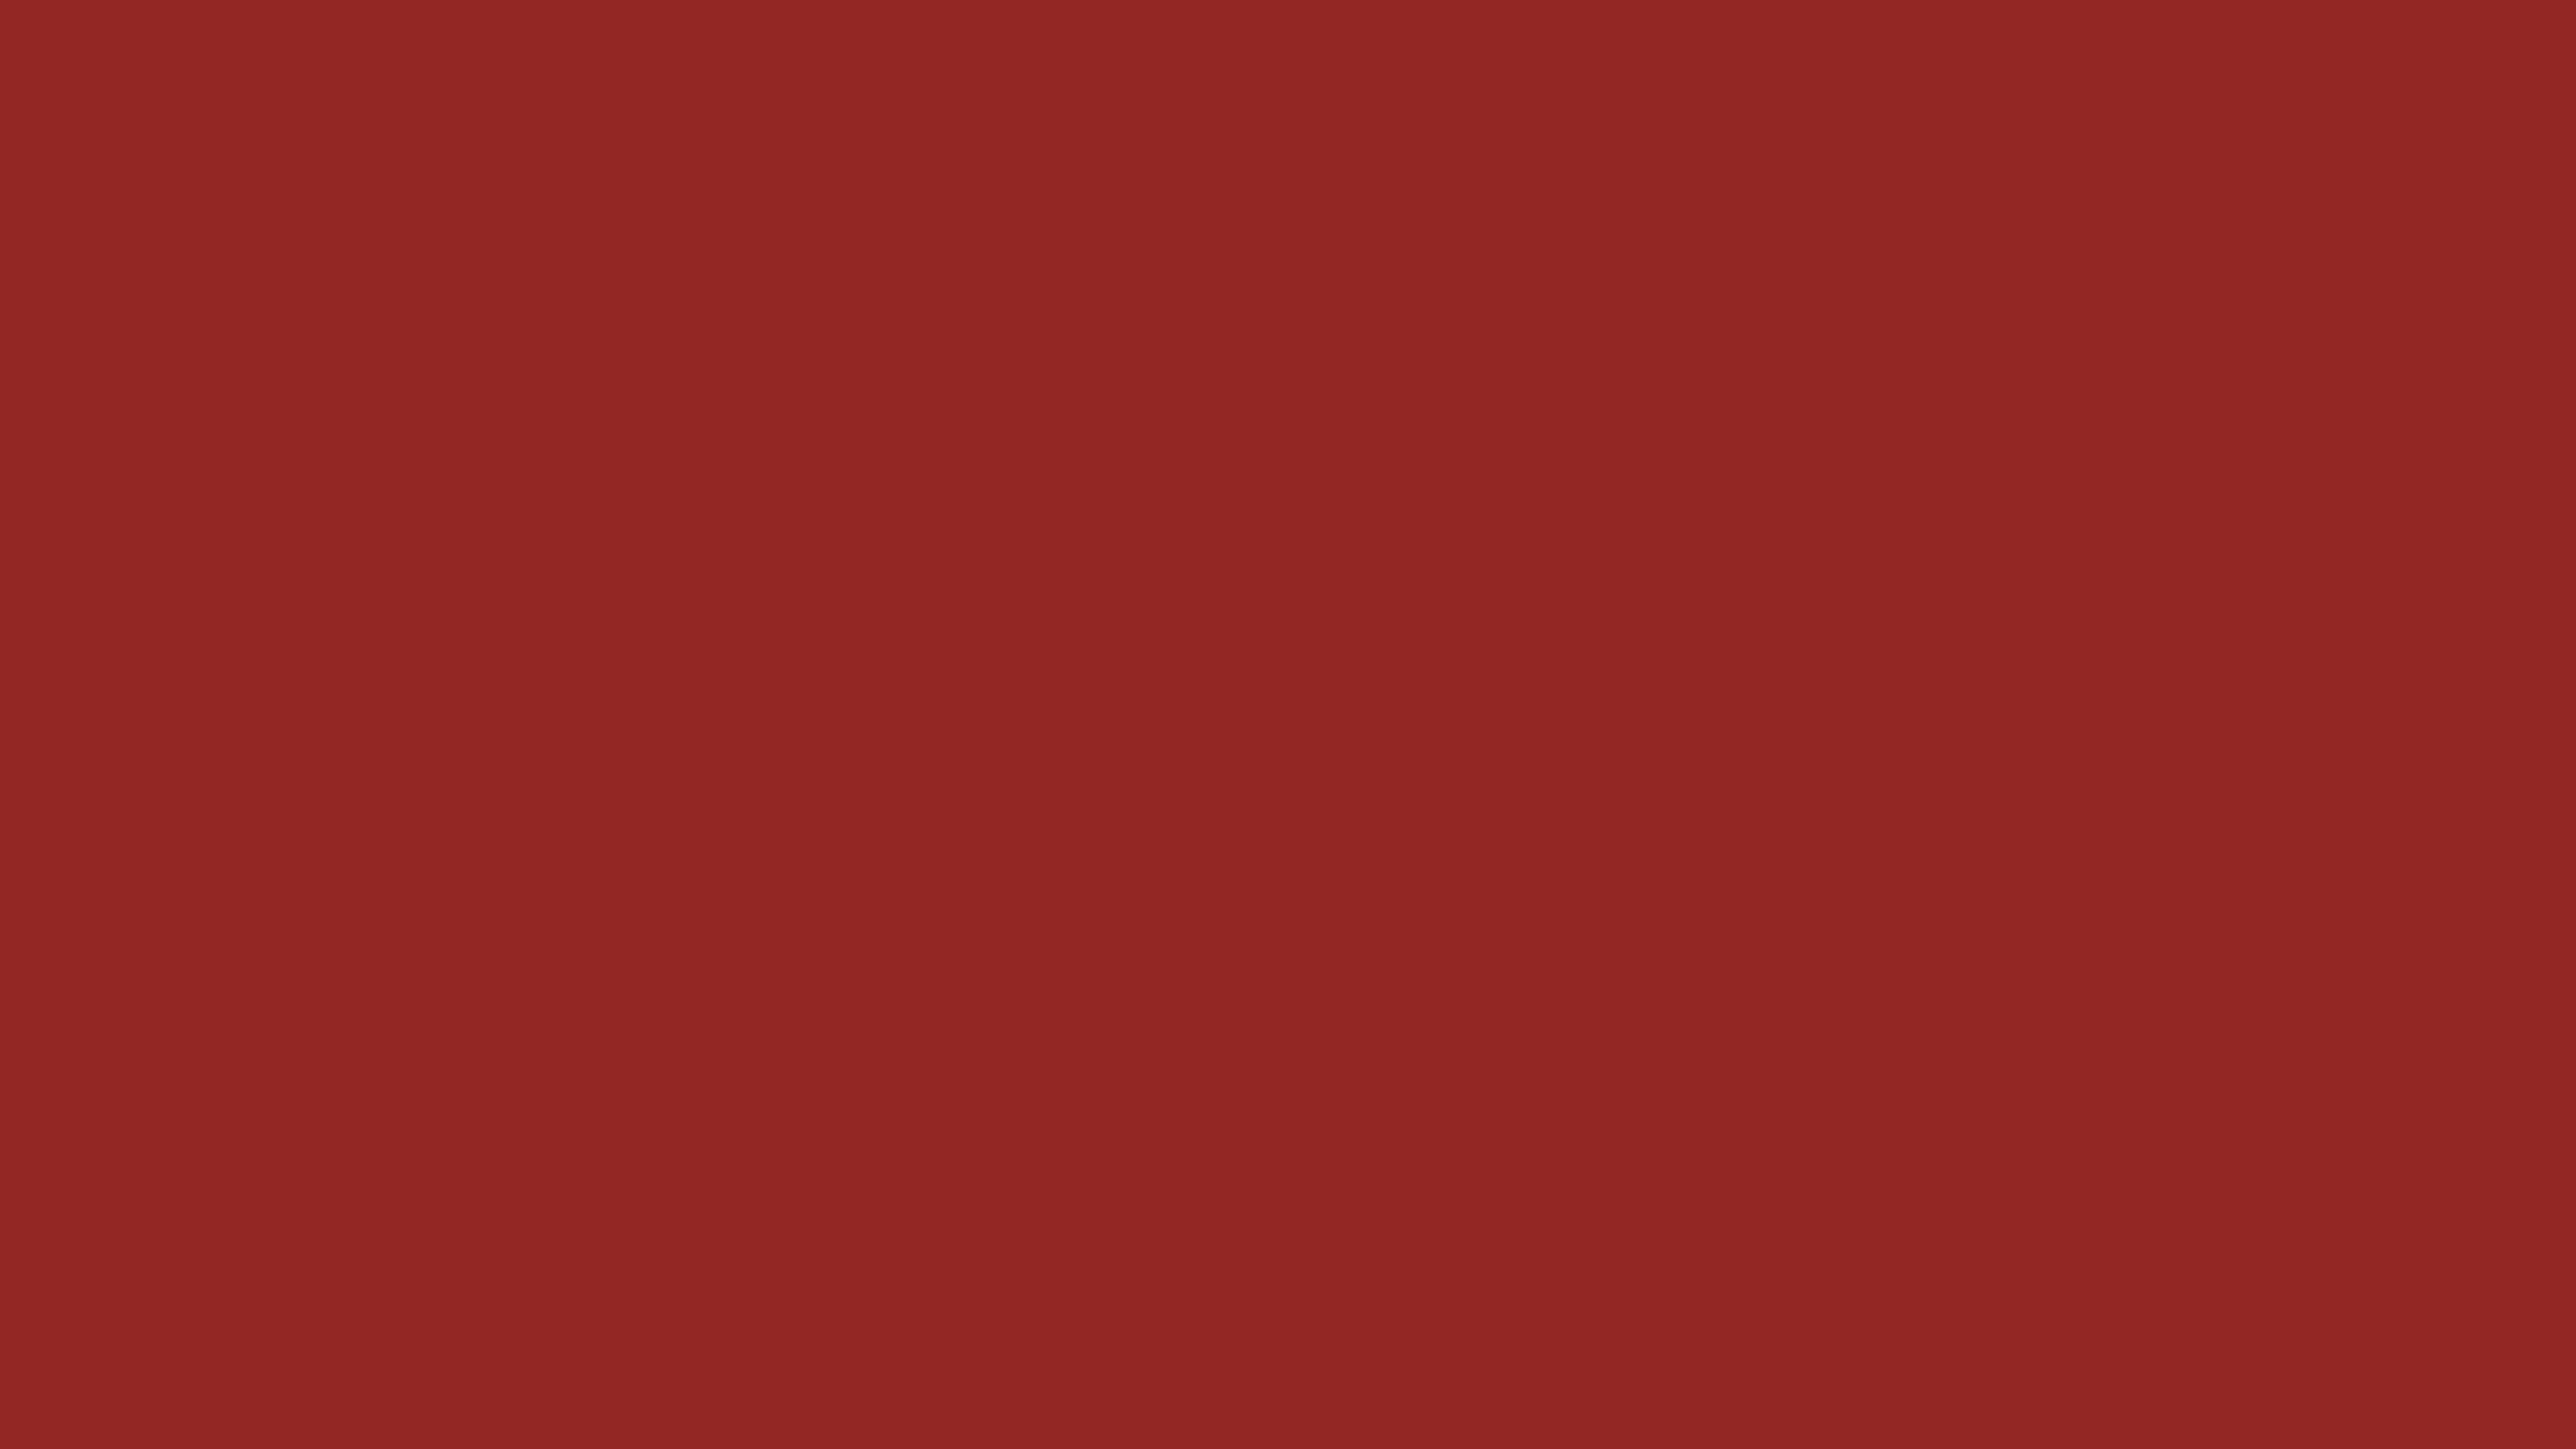 4096x2304 Vivid Auburn Solid Color Background